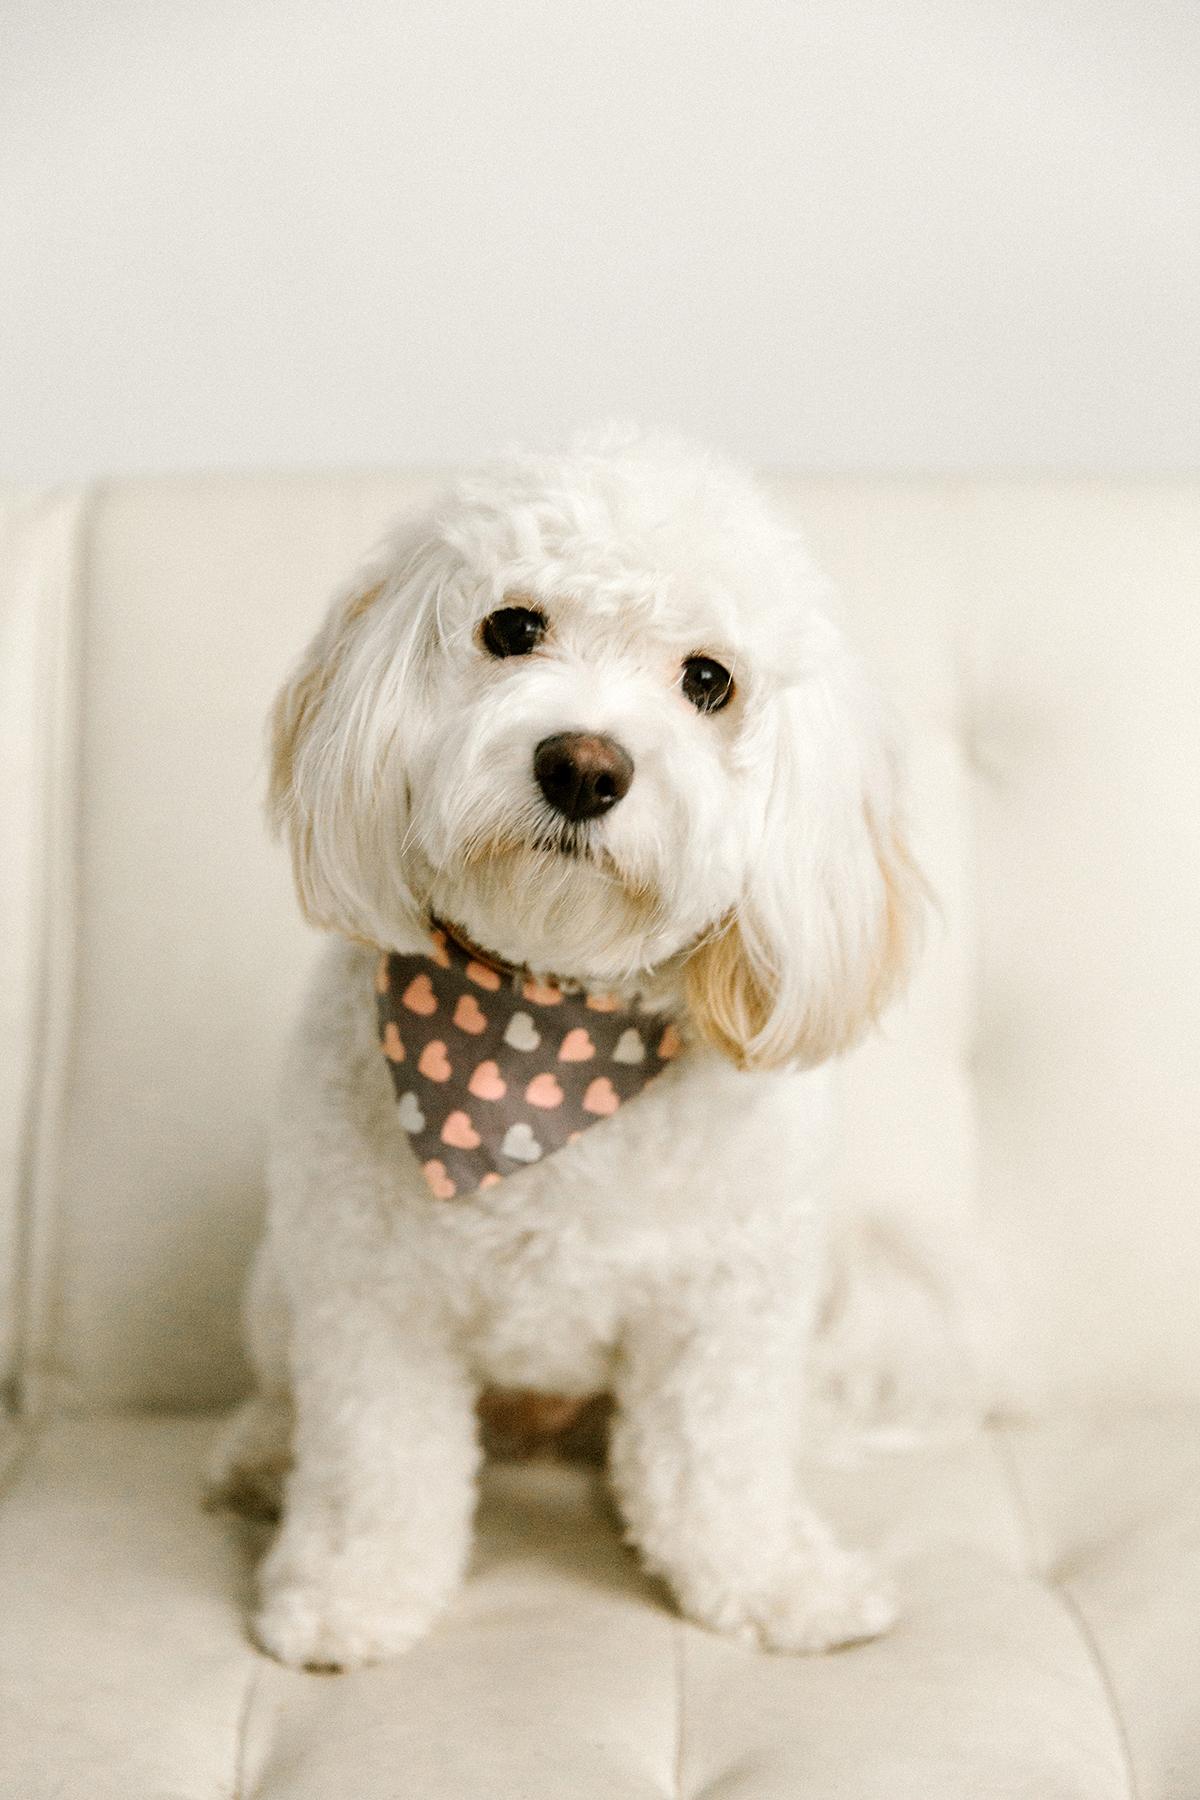 09072019-Dogs-031.jpg